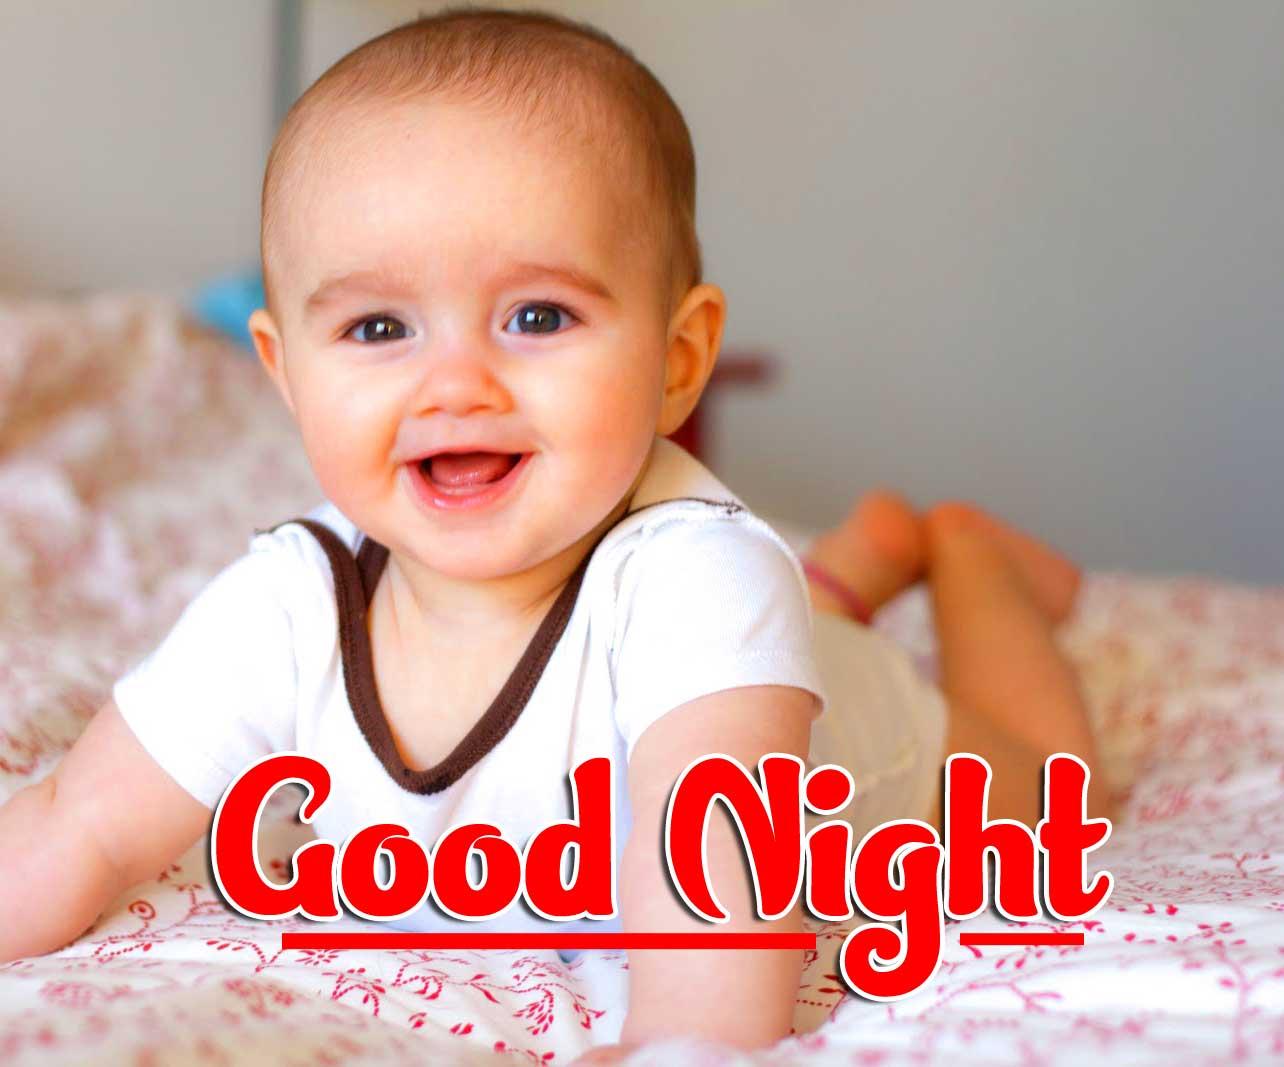 Cute Babies Good Night ImagesPics Wallpaper HD Dow load